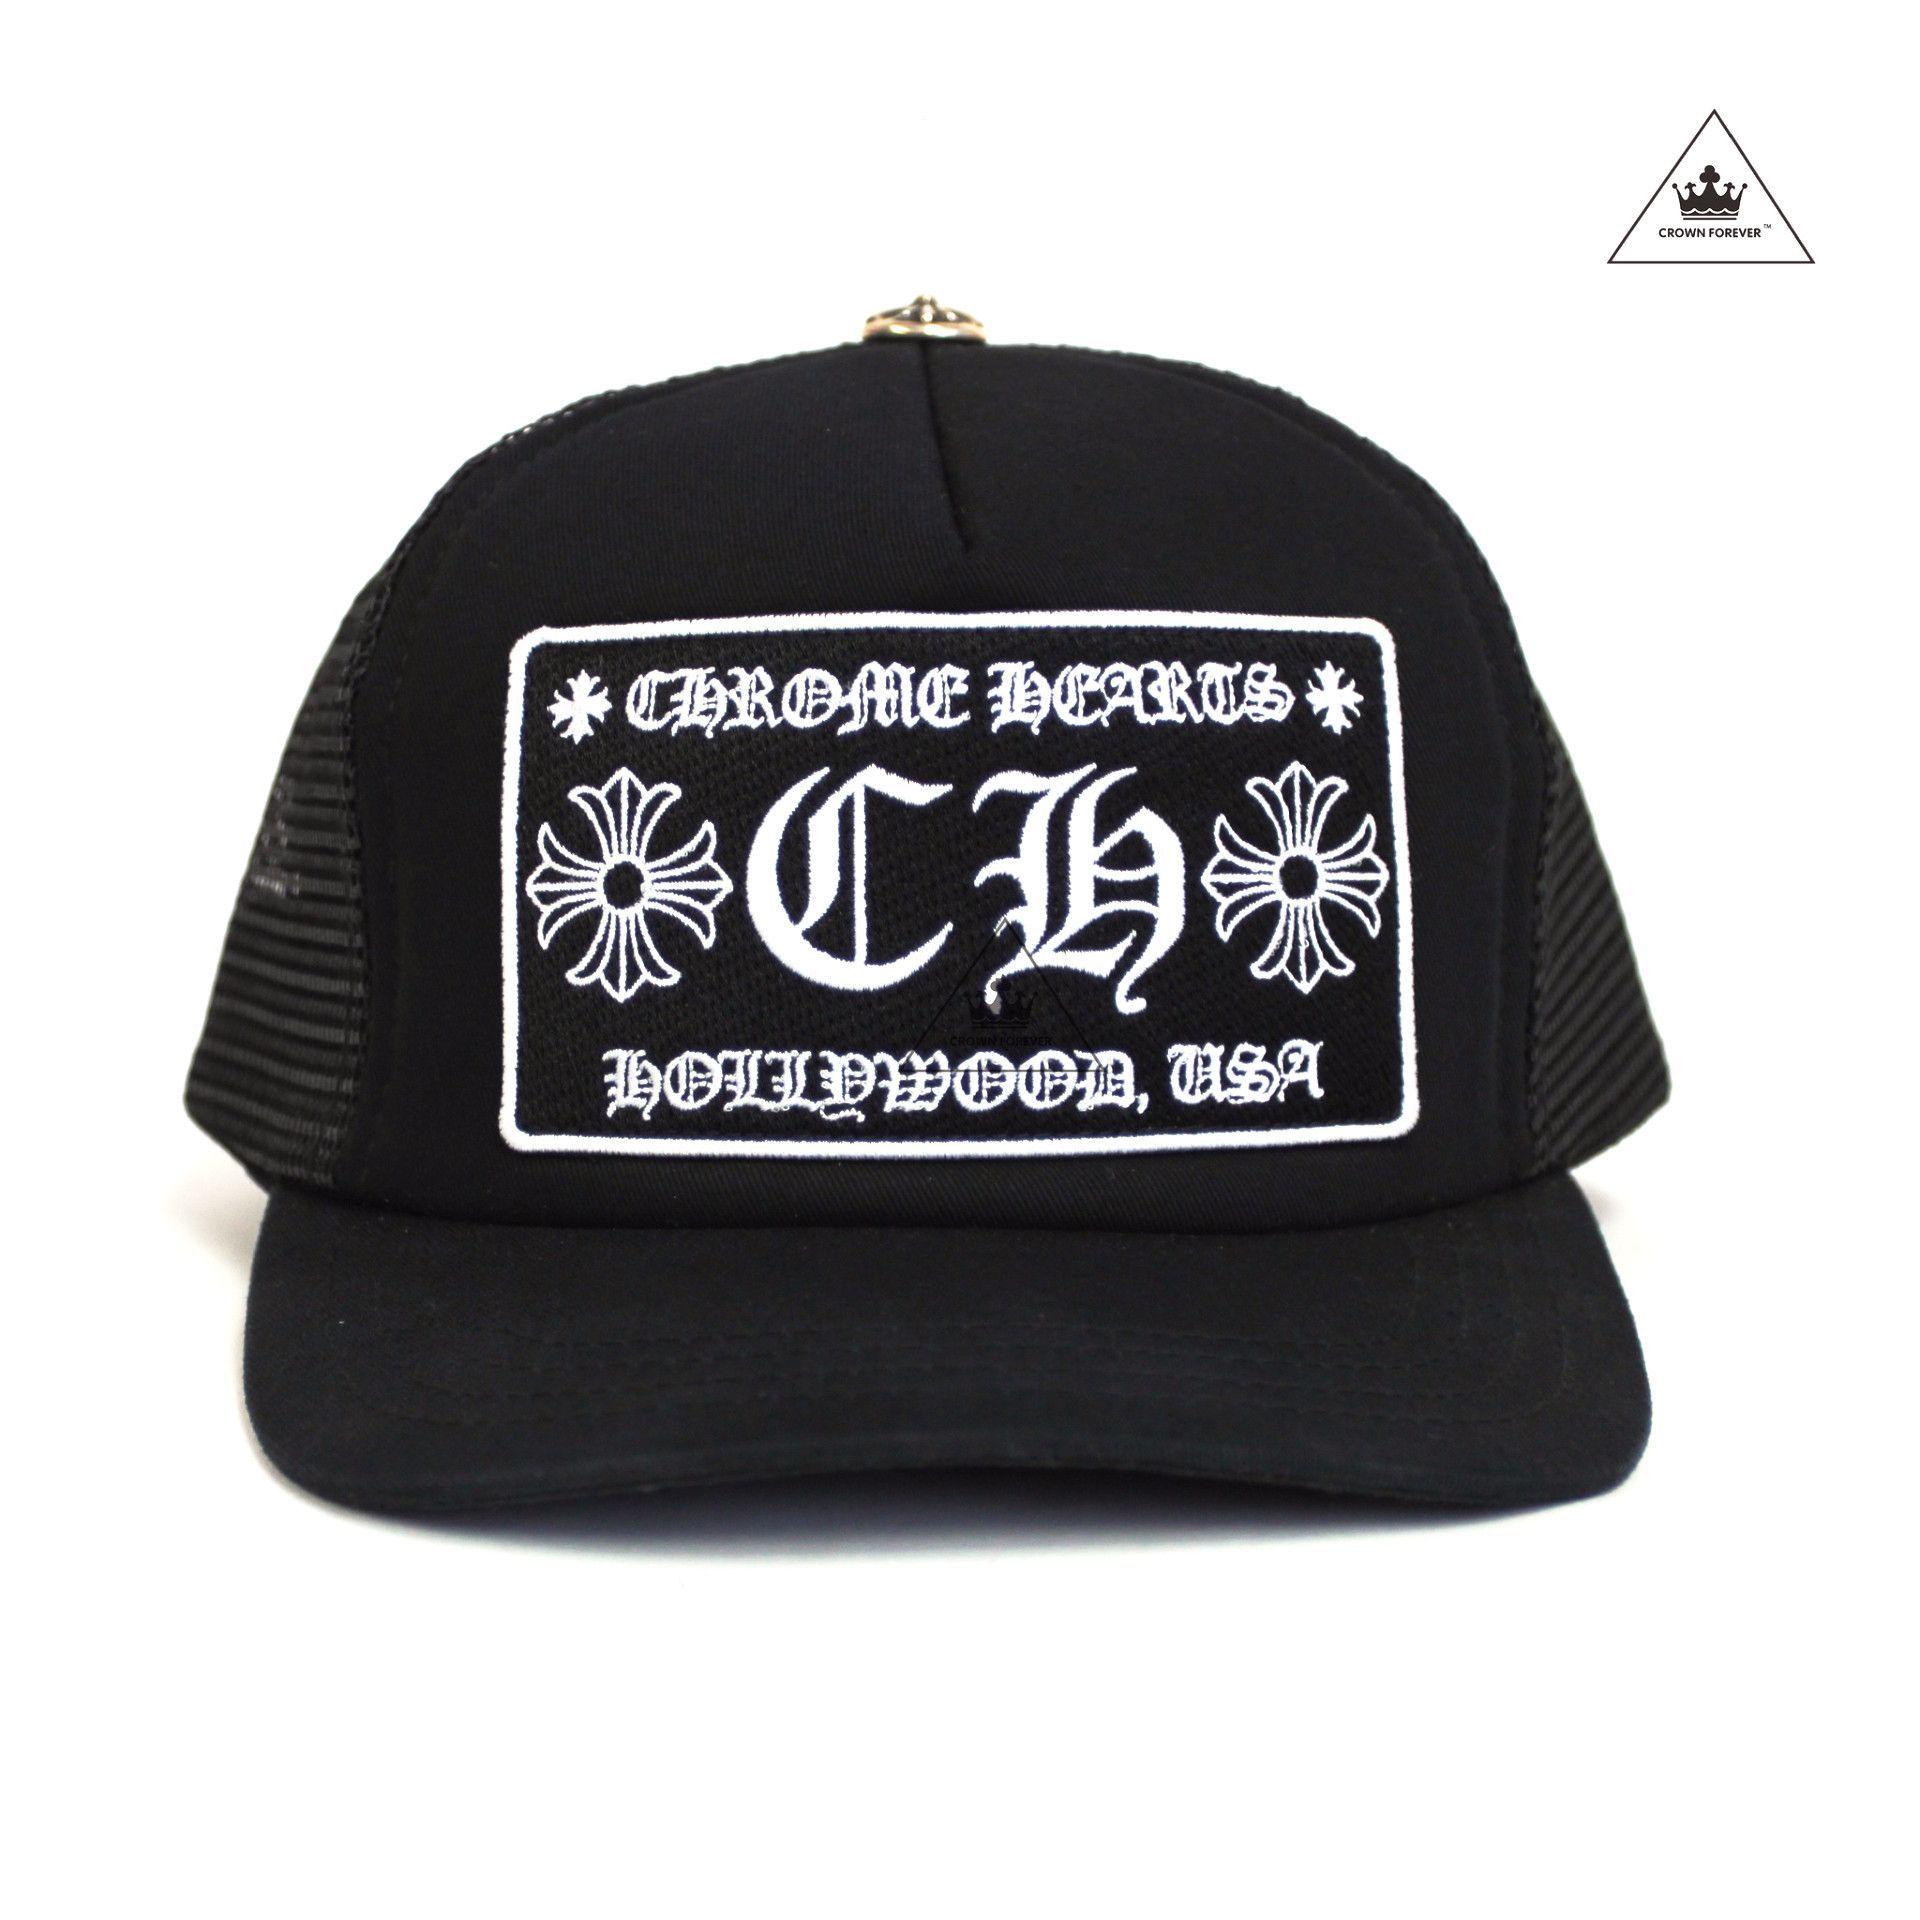 37bd855610c8e Chrome Hearts Hollywood Patch Mesh Trucker Cap - Black Black